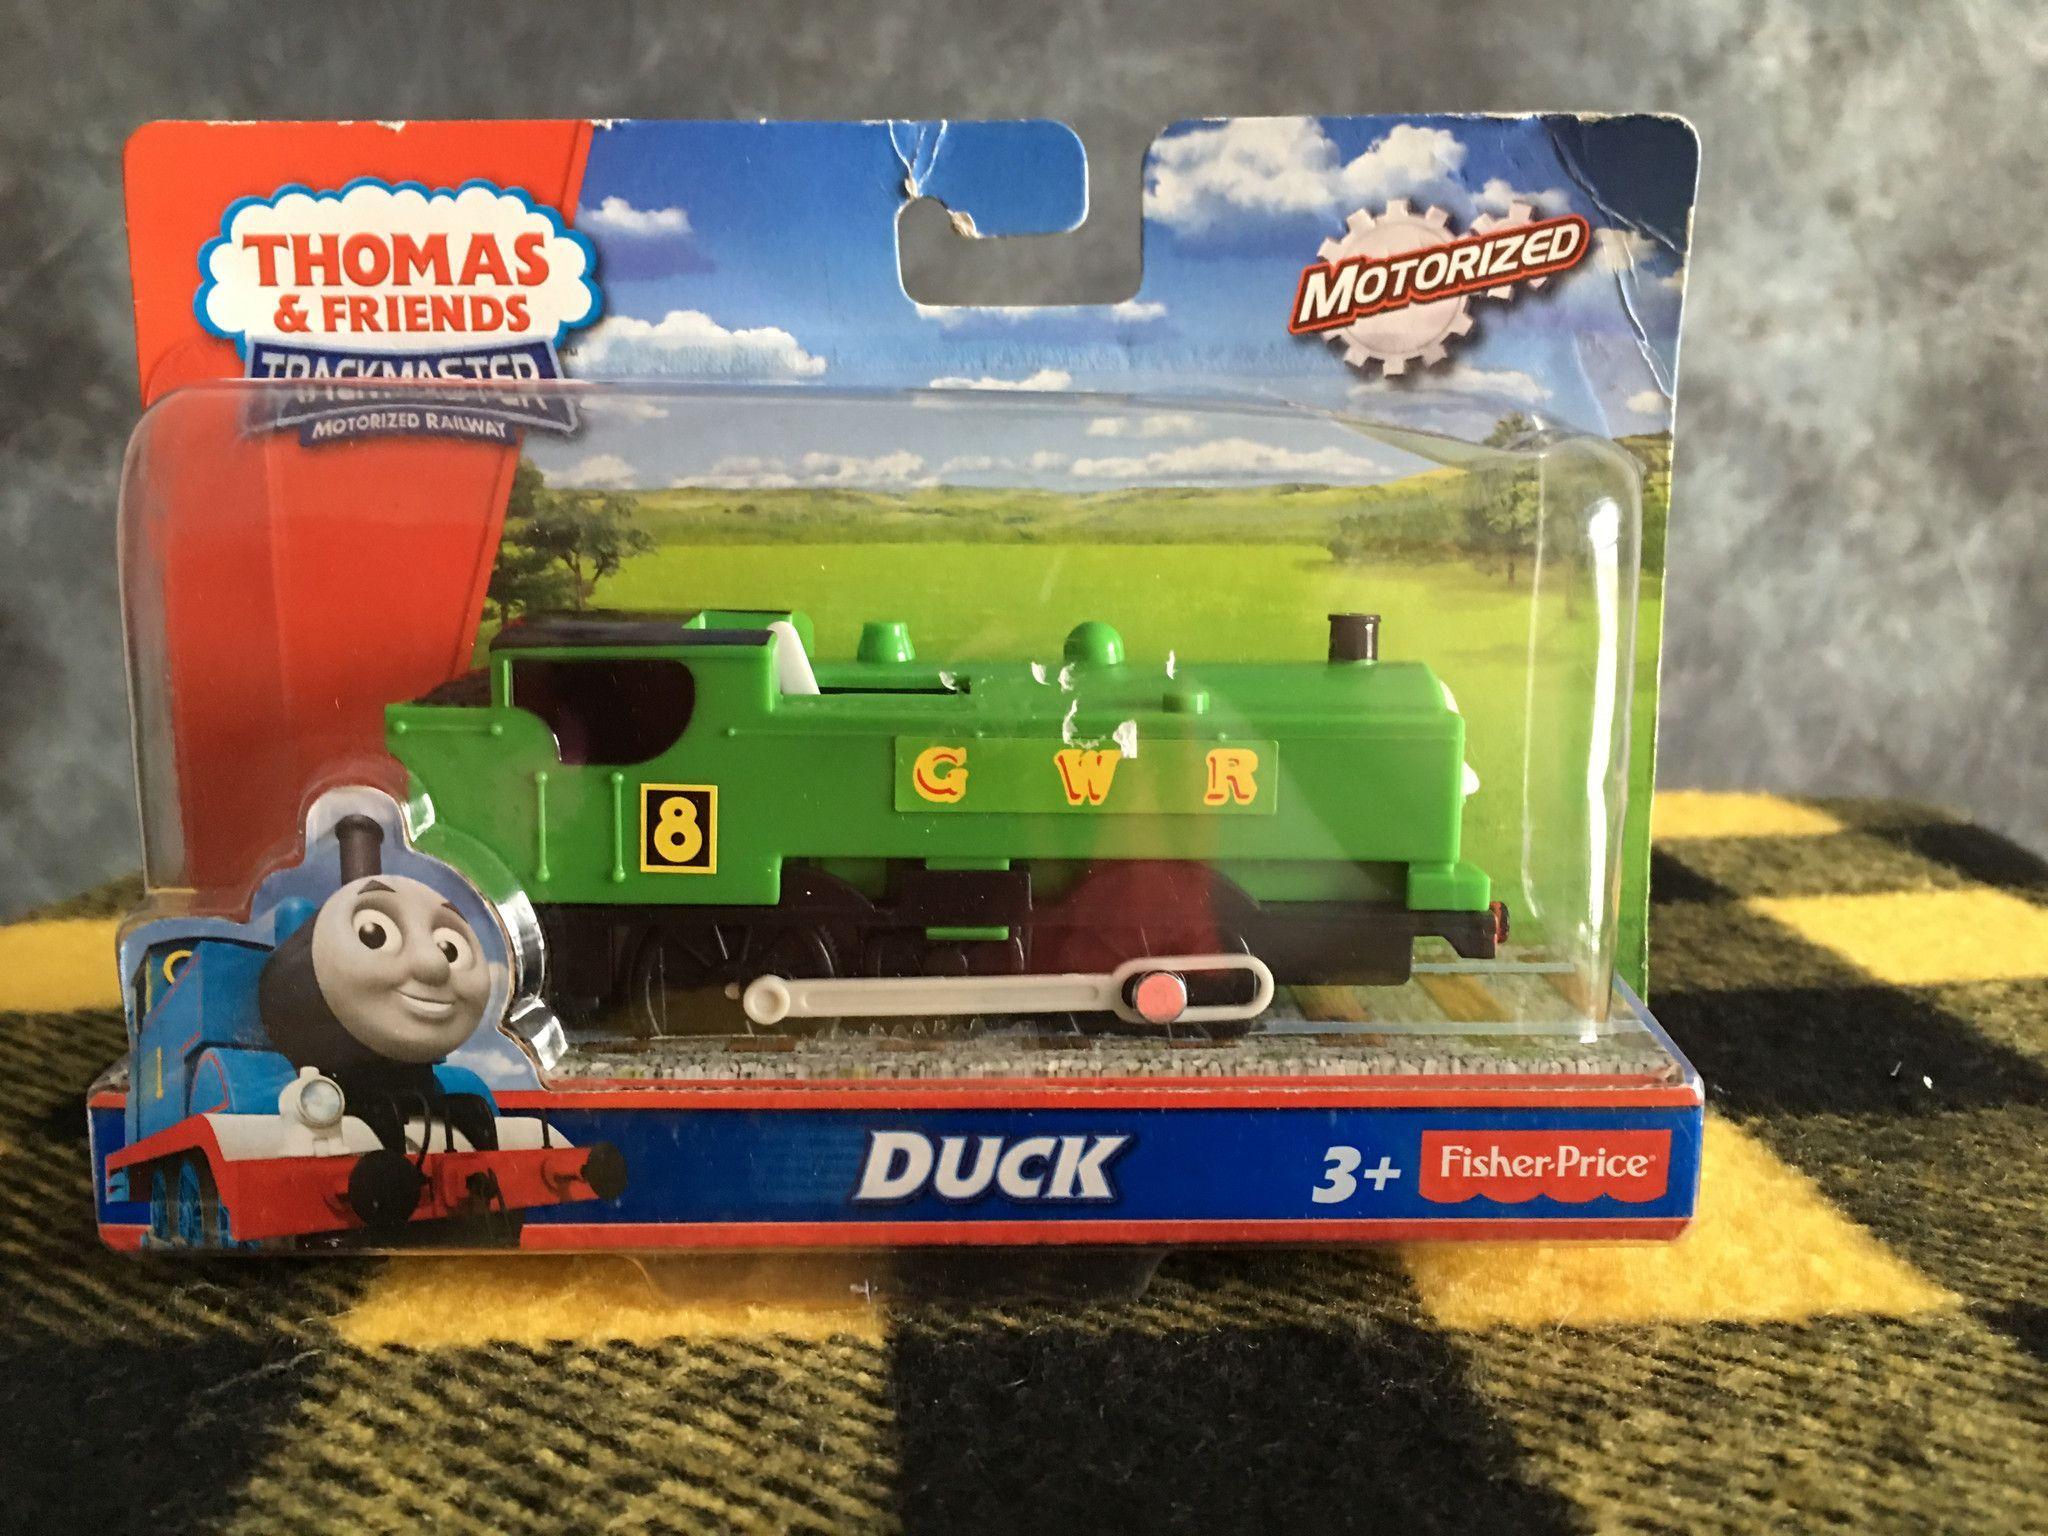 Thomas the tank engine wallpaper border - Thomas The Train Trackmaster Little Friends Duck